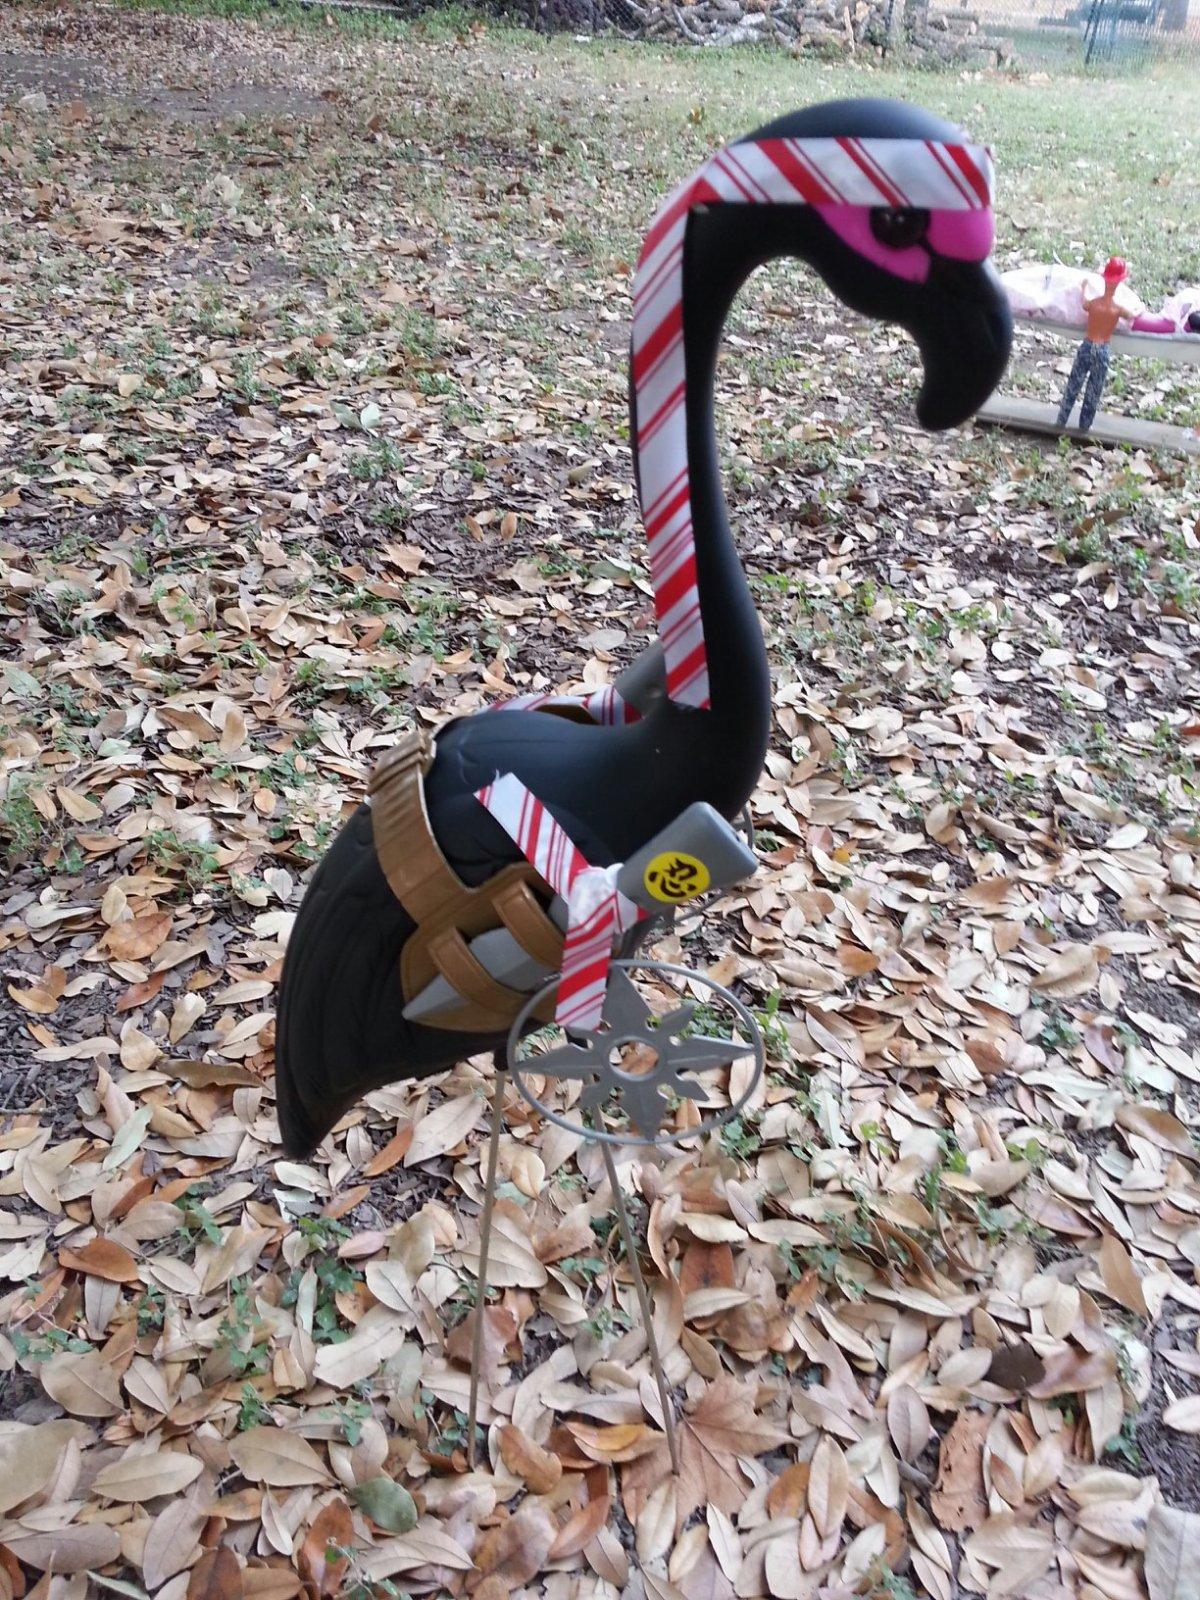 Click image for larger version  Name:Blanco Flamingo Ninja!.jpg Views:78 Size:573.9 KB ID:174334